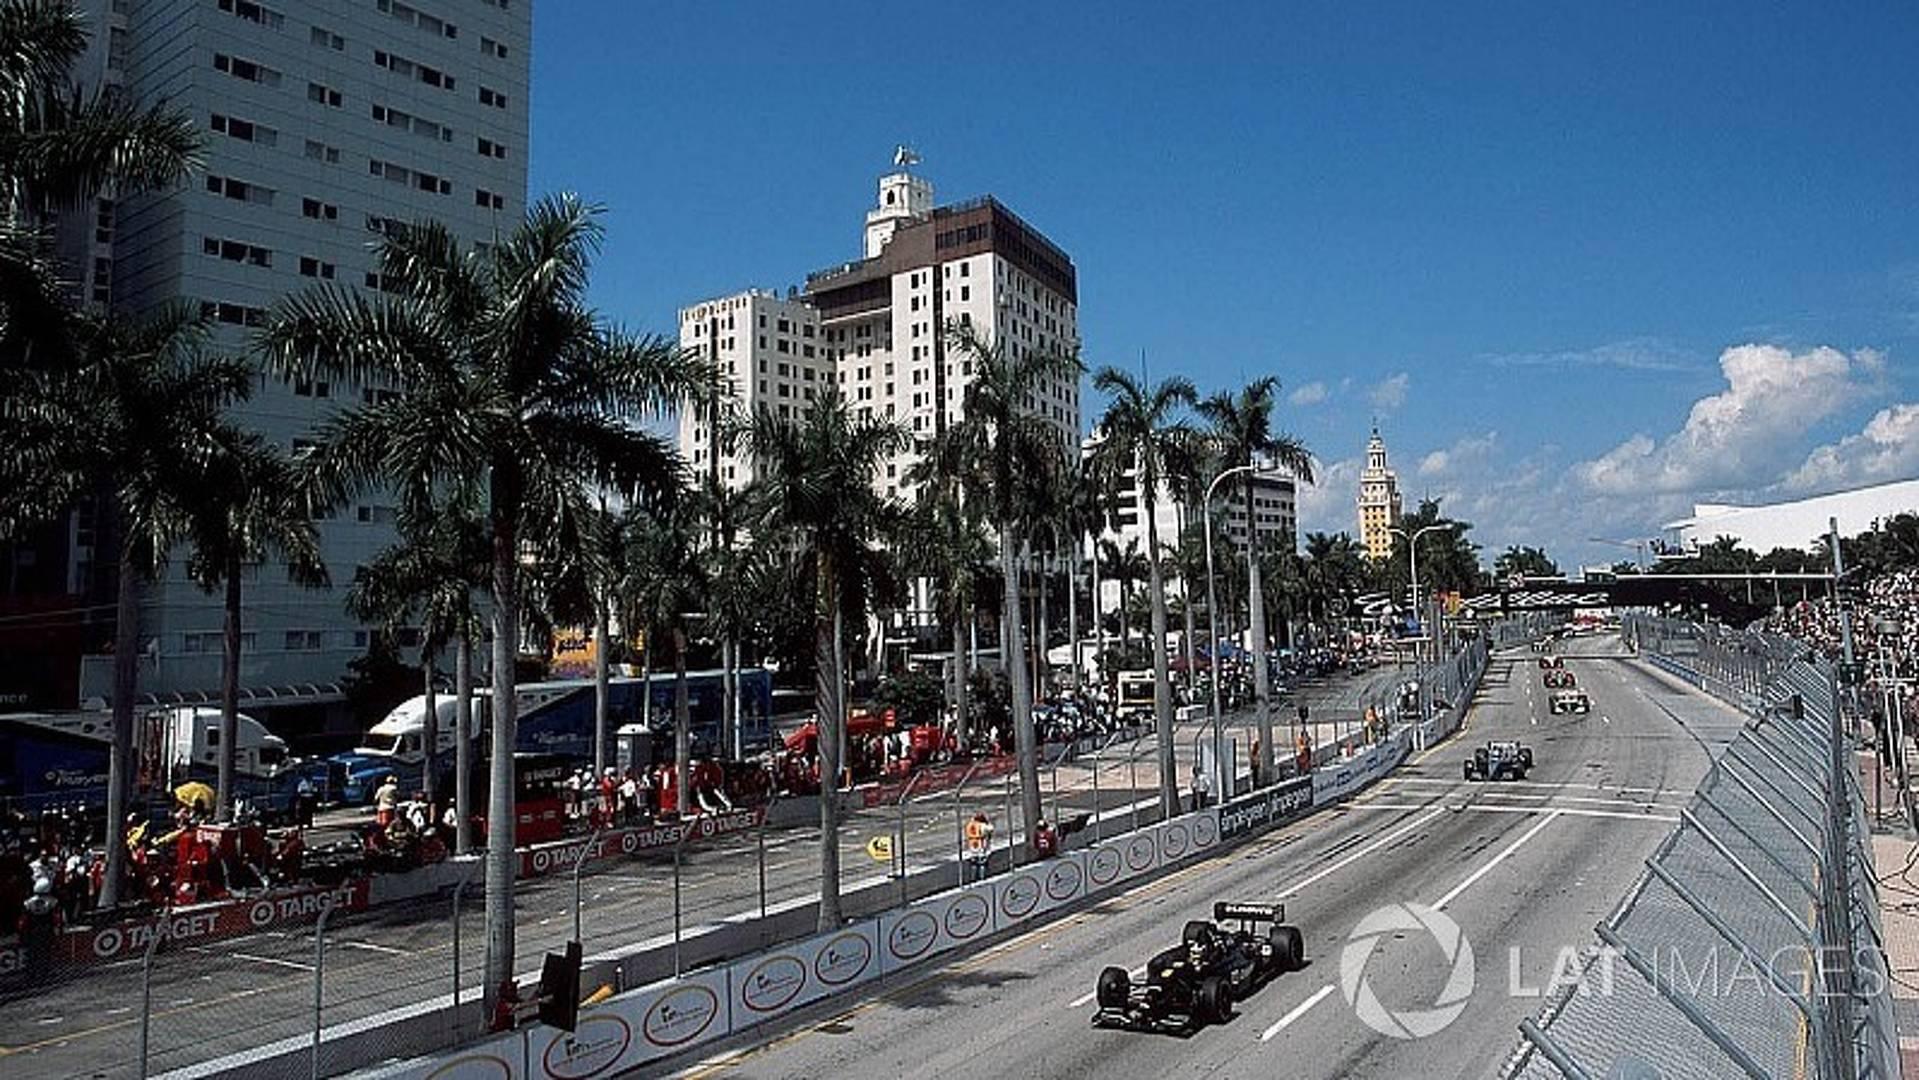 Increíble Arte De Uñas Miami Motivo - Ideas de Diseño de Arte de ...